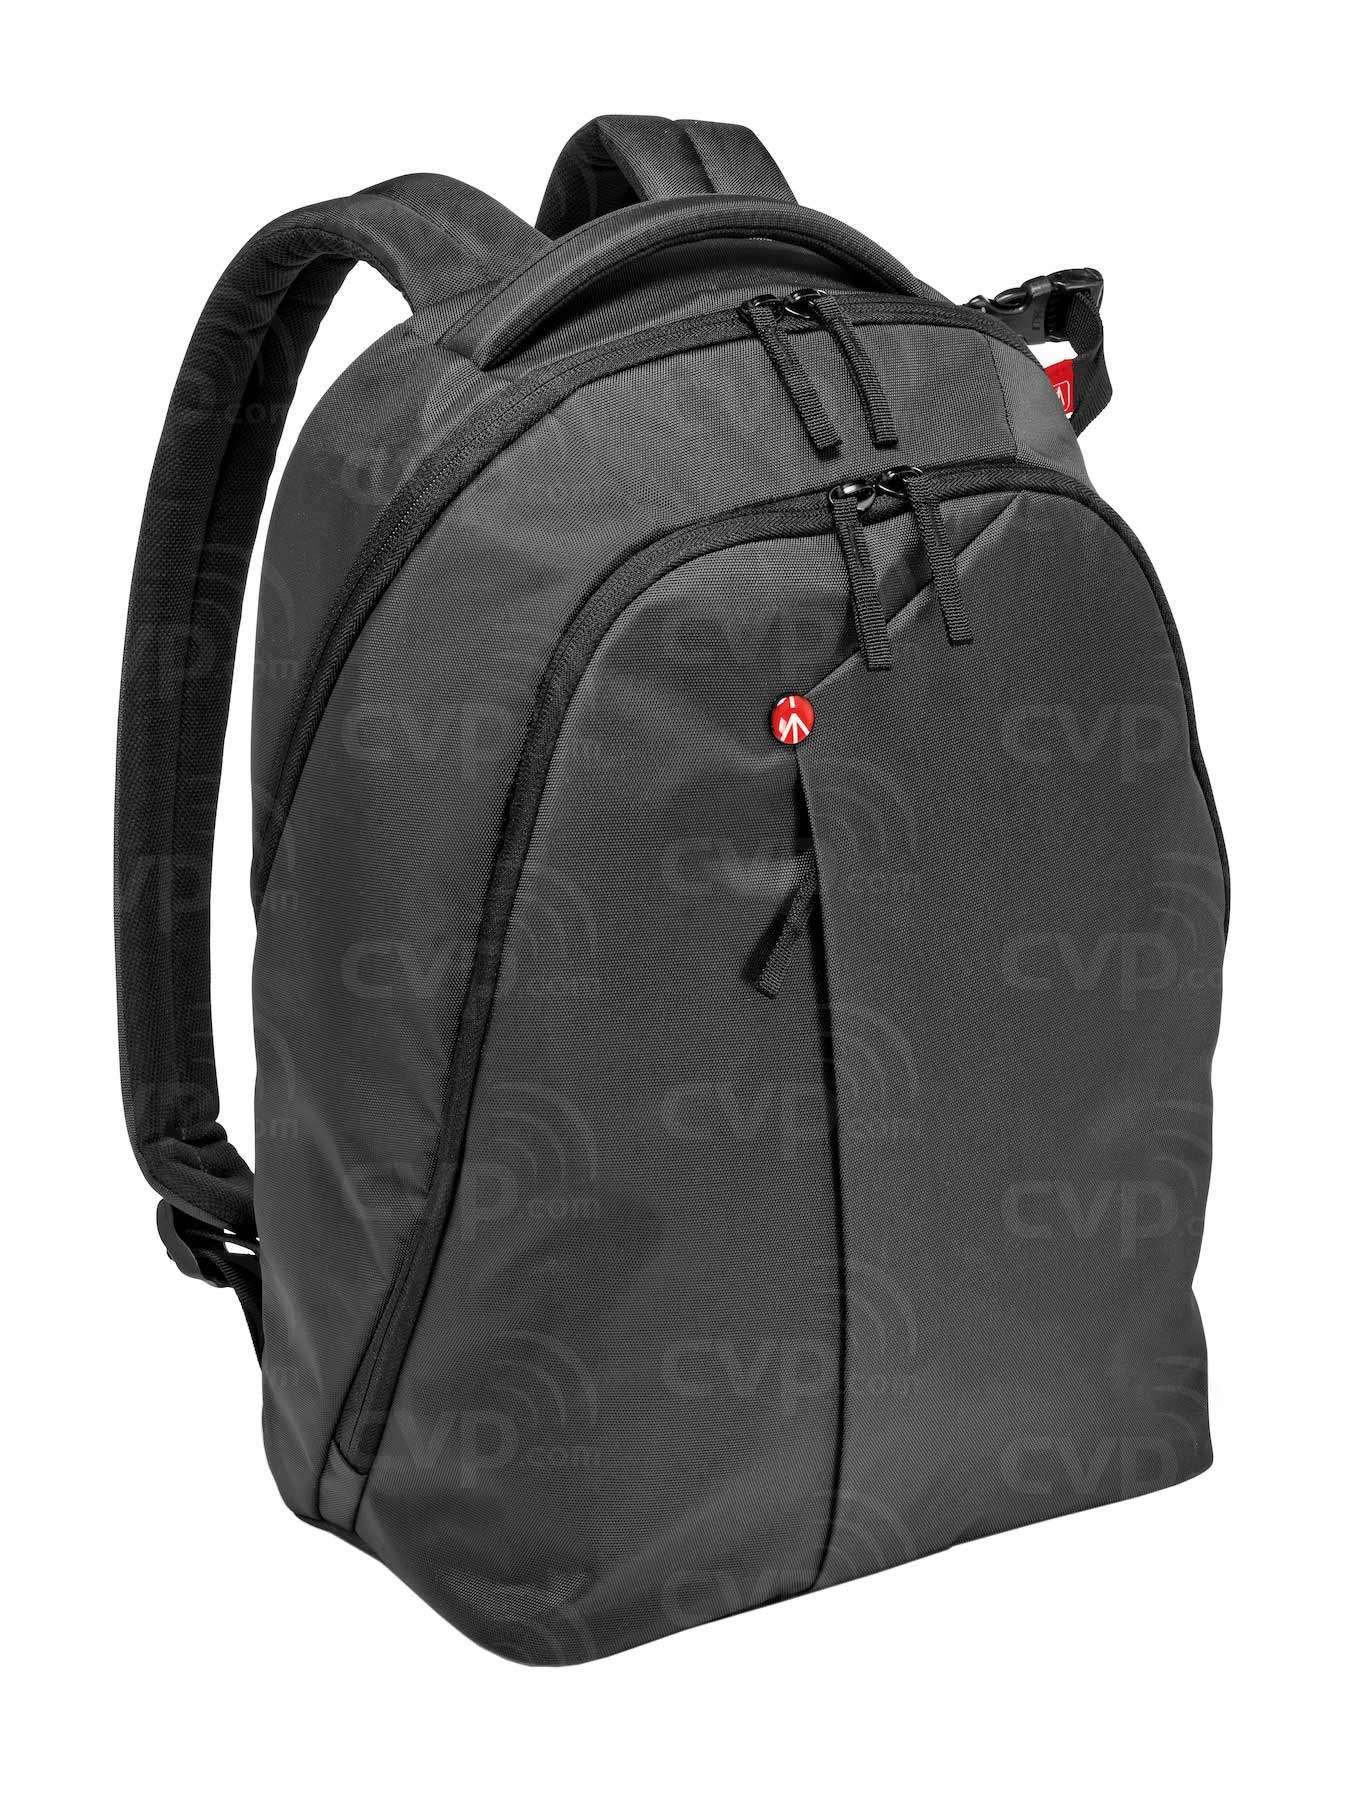 Manfrotto MB NX-BP-VGY (MBNXBPVGY) NX Camera Backpack V - Grey